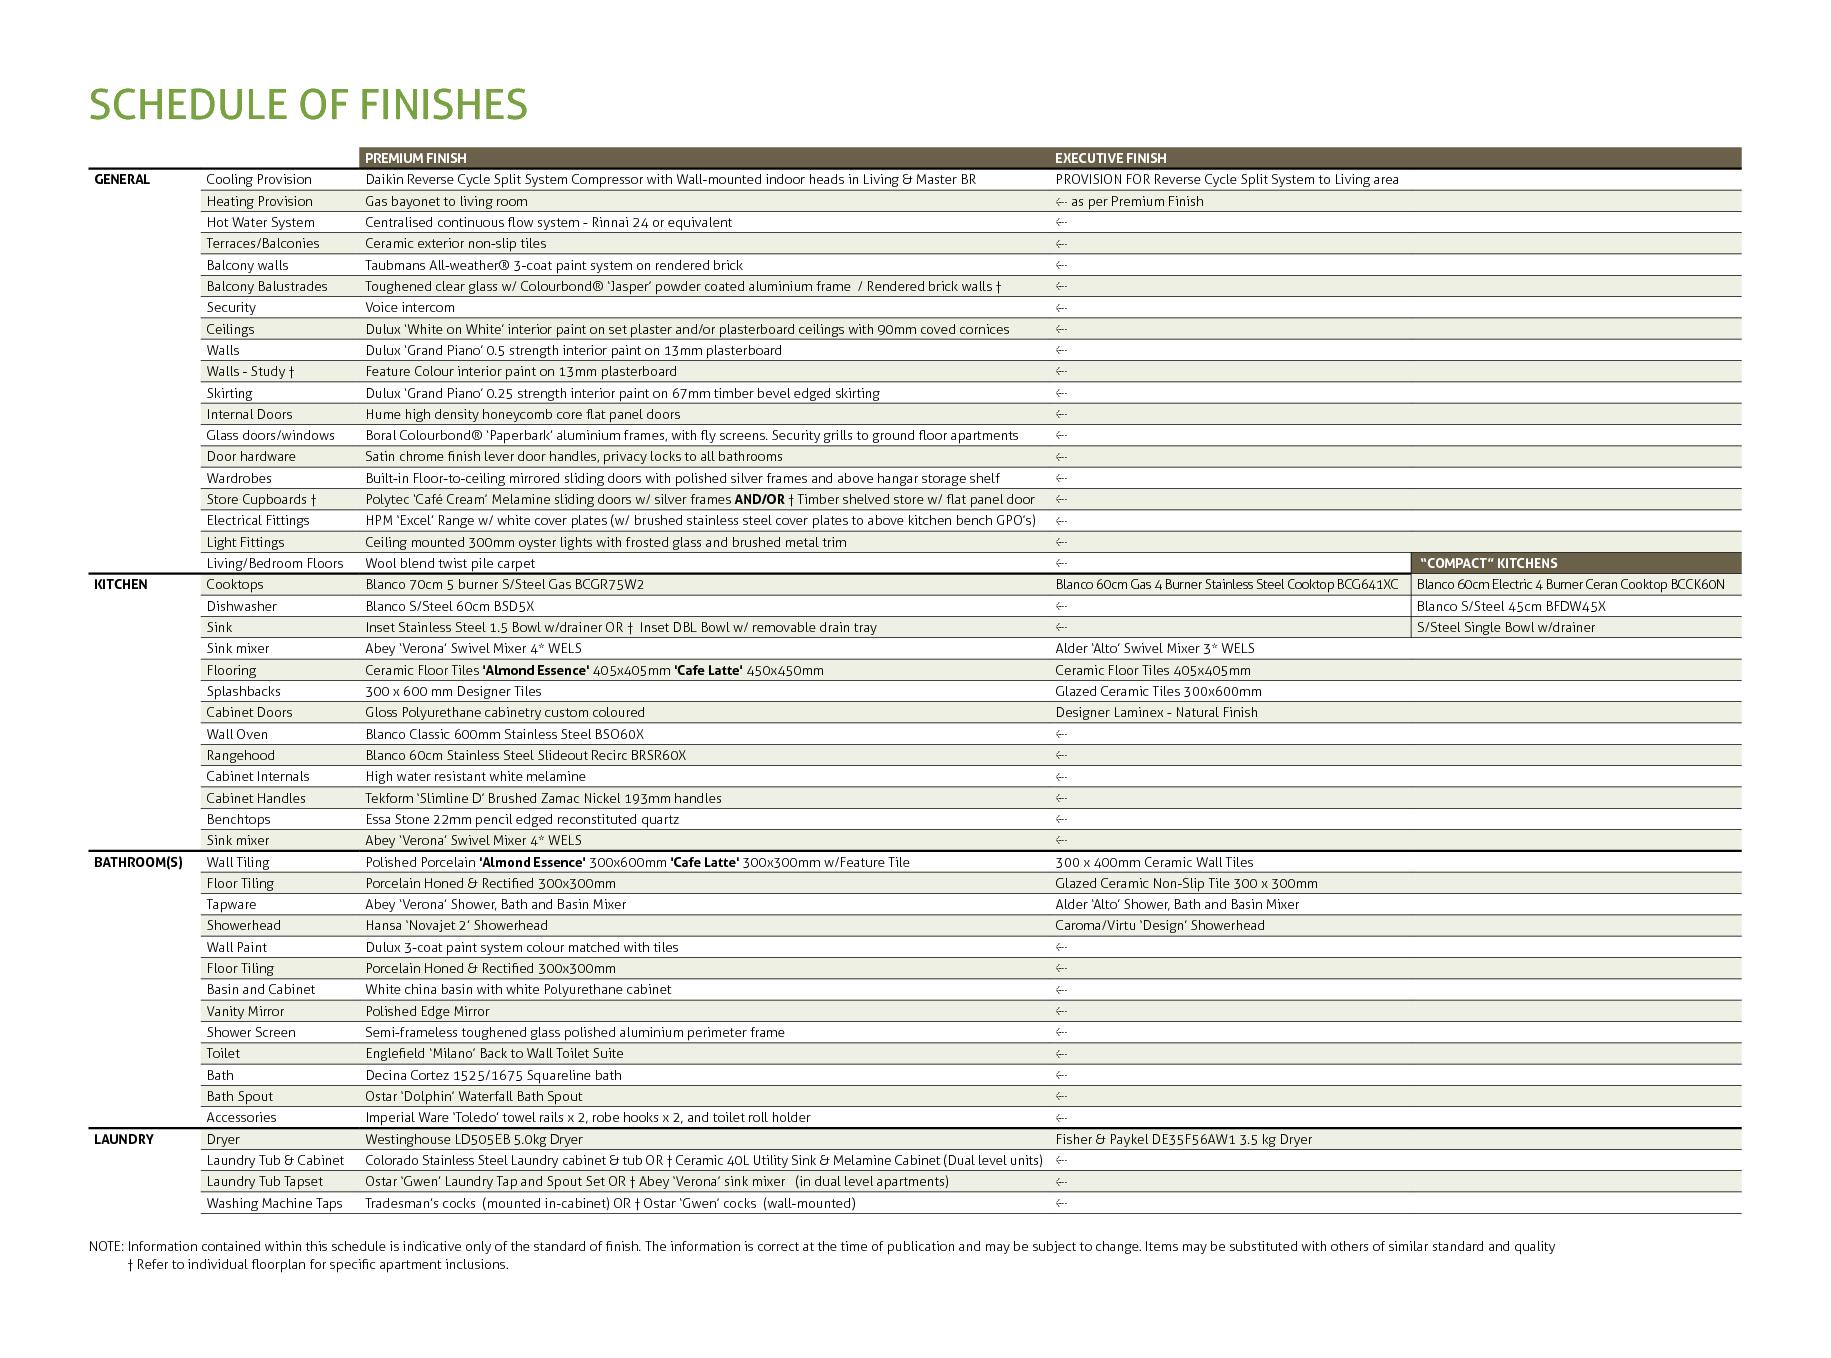 Interior Design Furniture Schedule Example Schedule Template